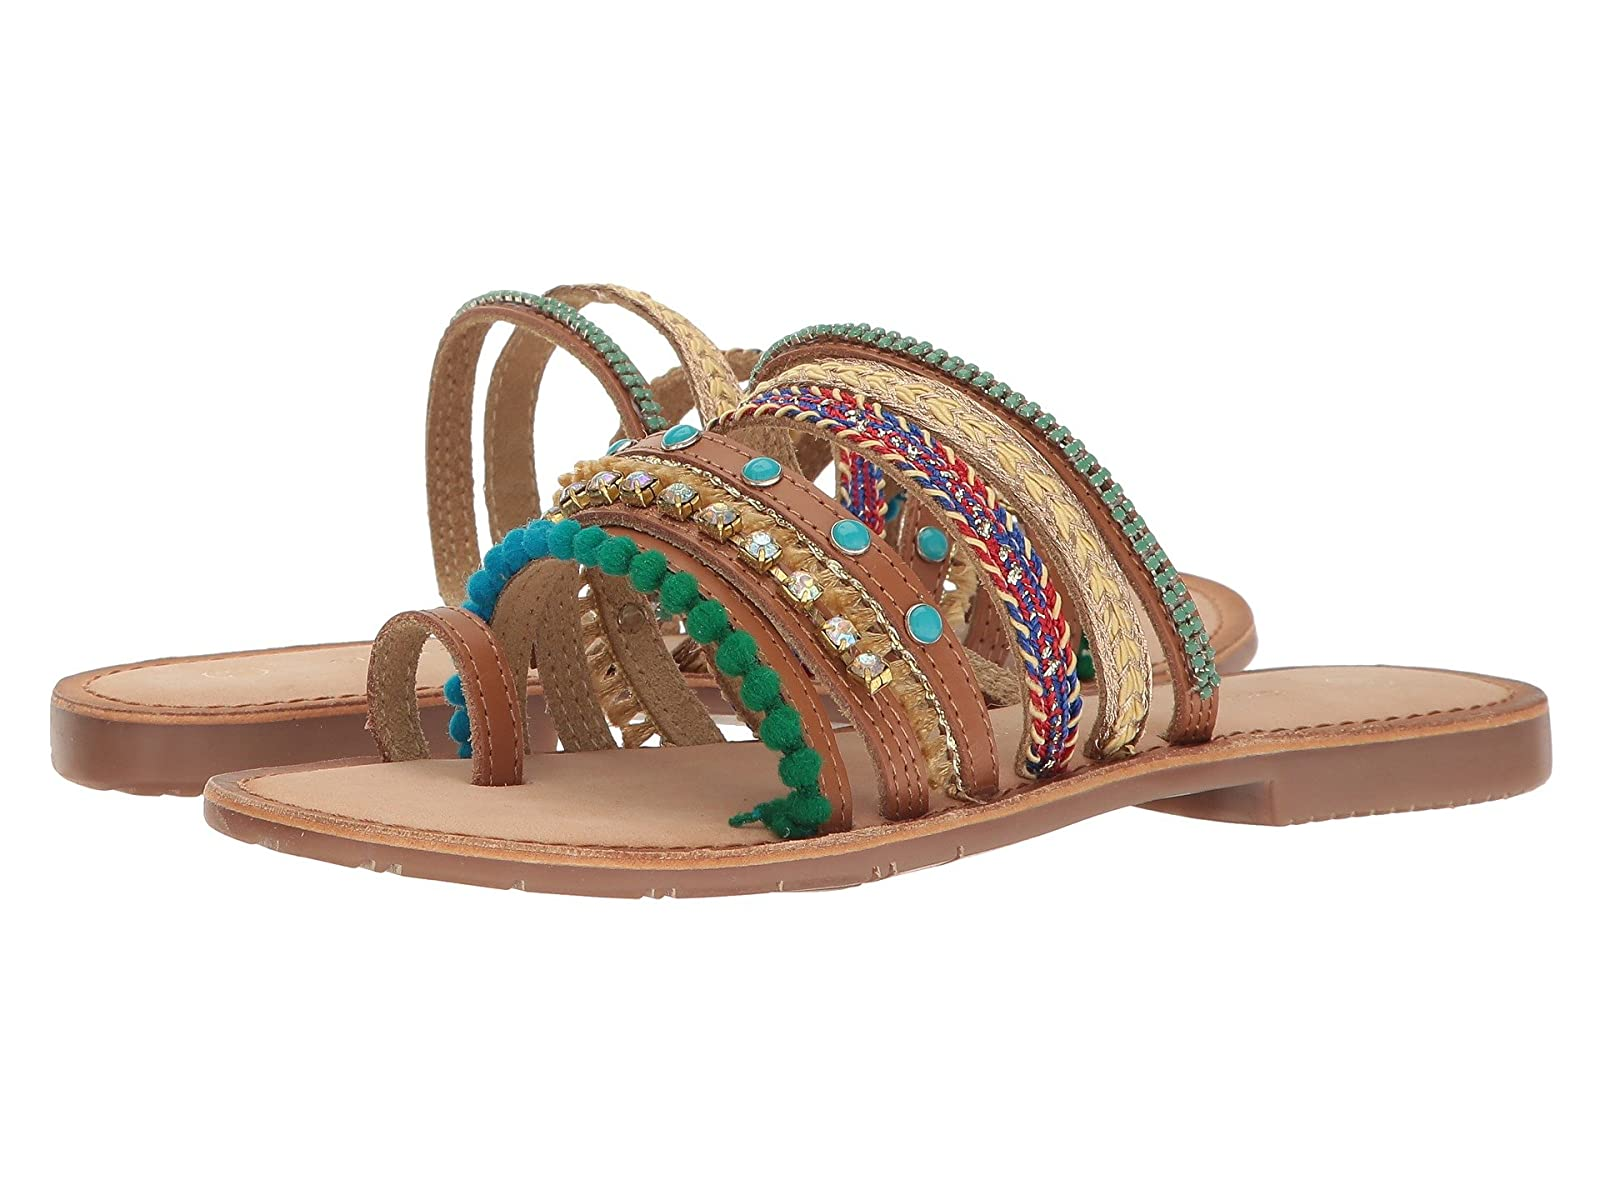 Chinese Laundry Palma SandalCheap and distinctive eye-catching shoes